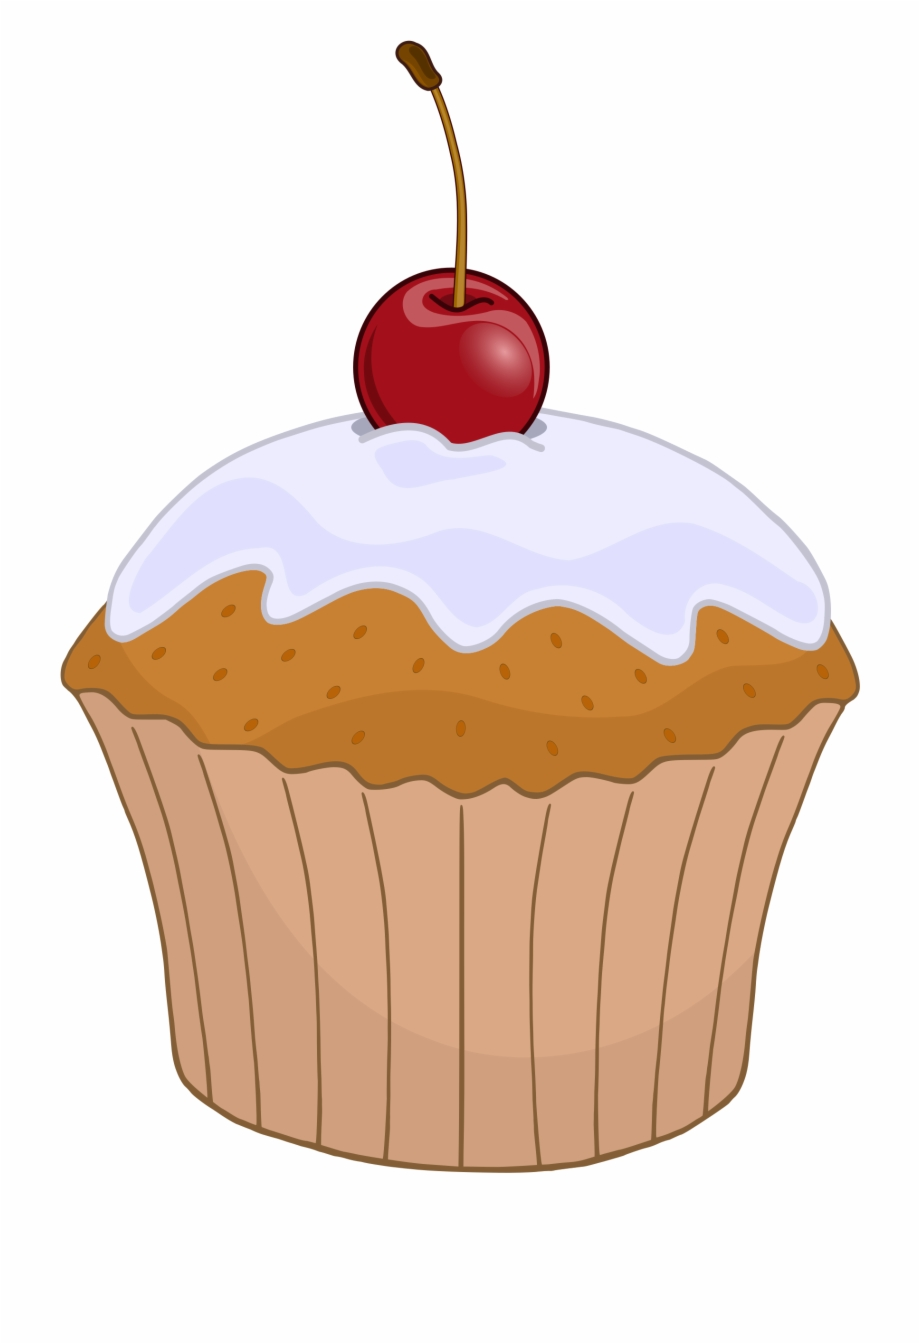 Clip art transparent png. Baking clipart muffin